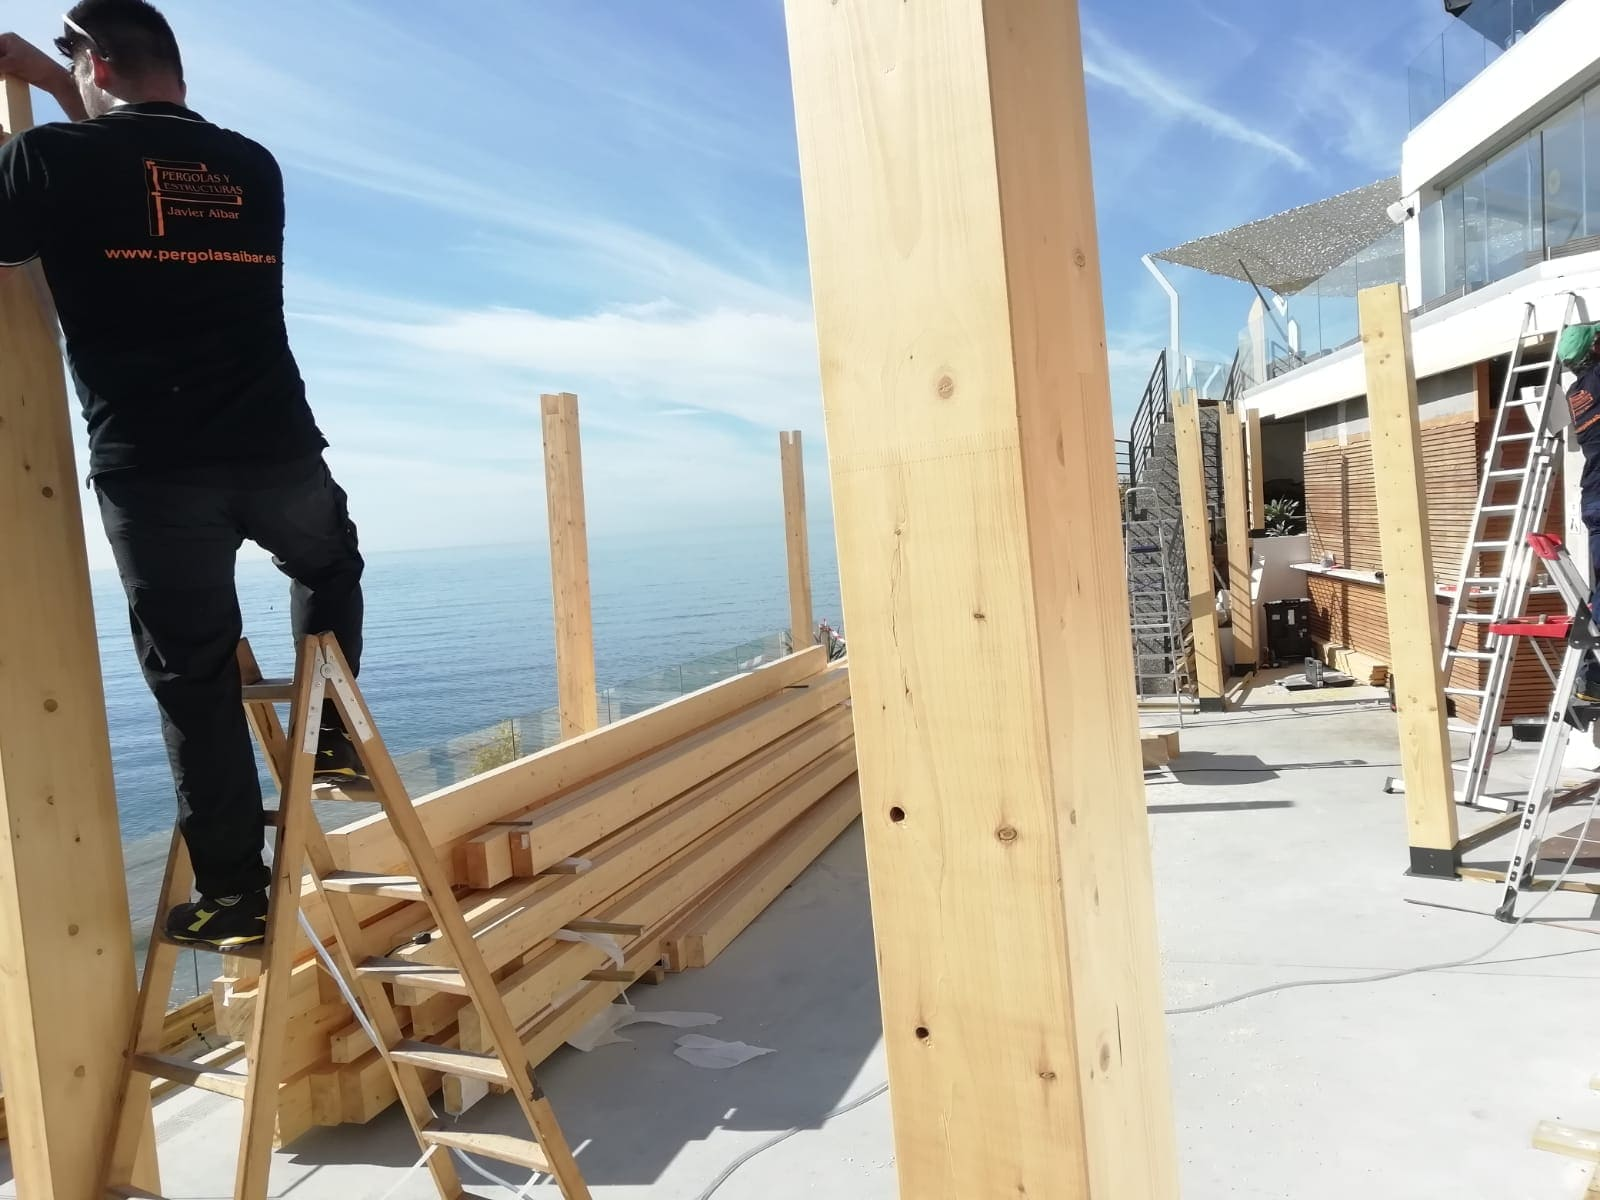 instalacion de pergolas de madera